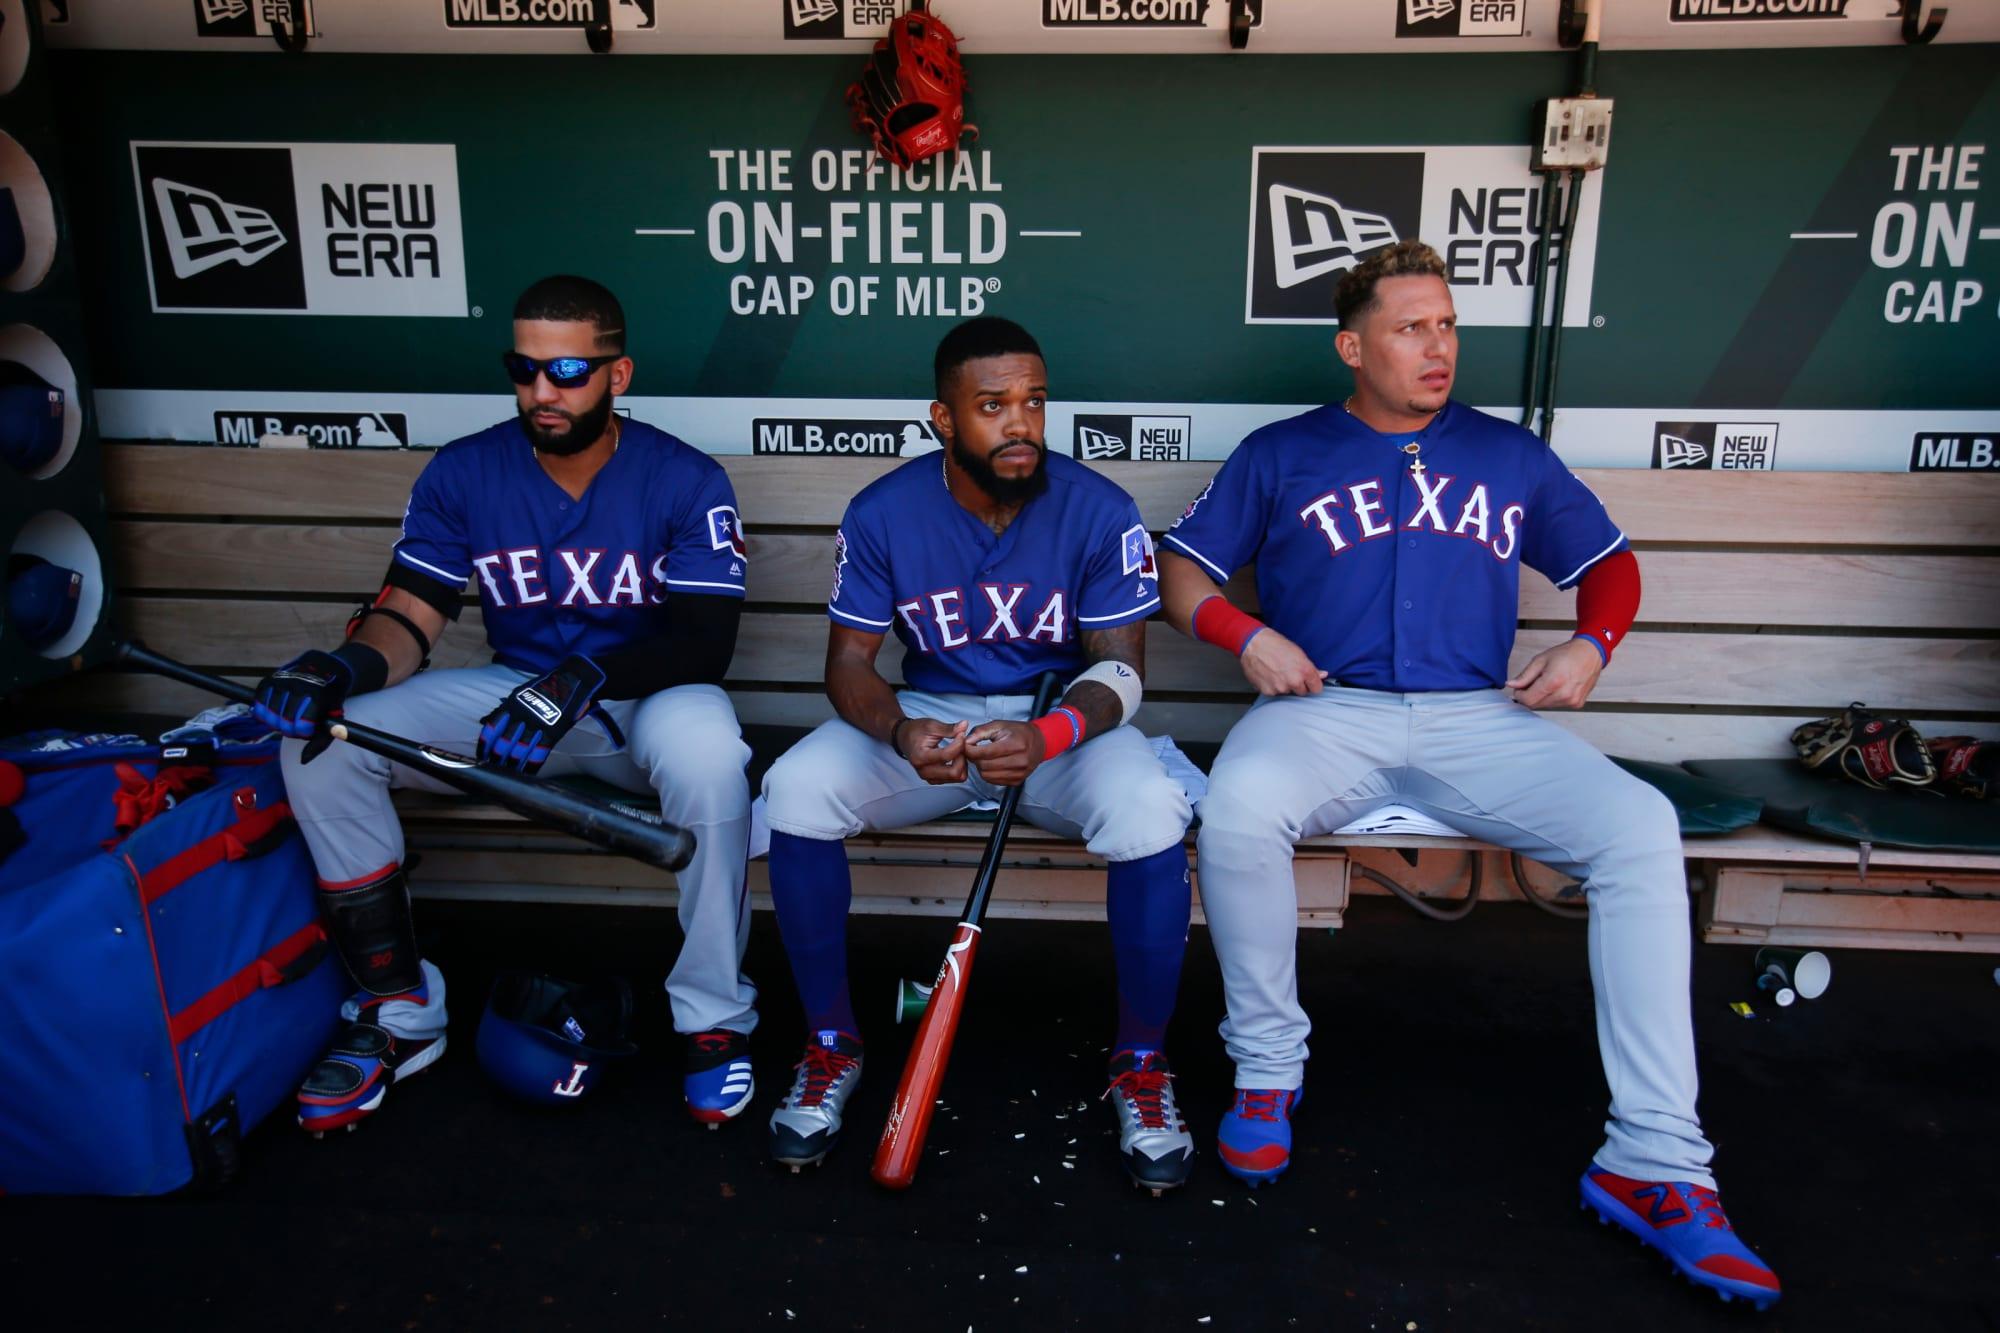 Washington Post editorial calls for Texas Rangers to change their name